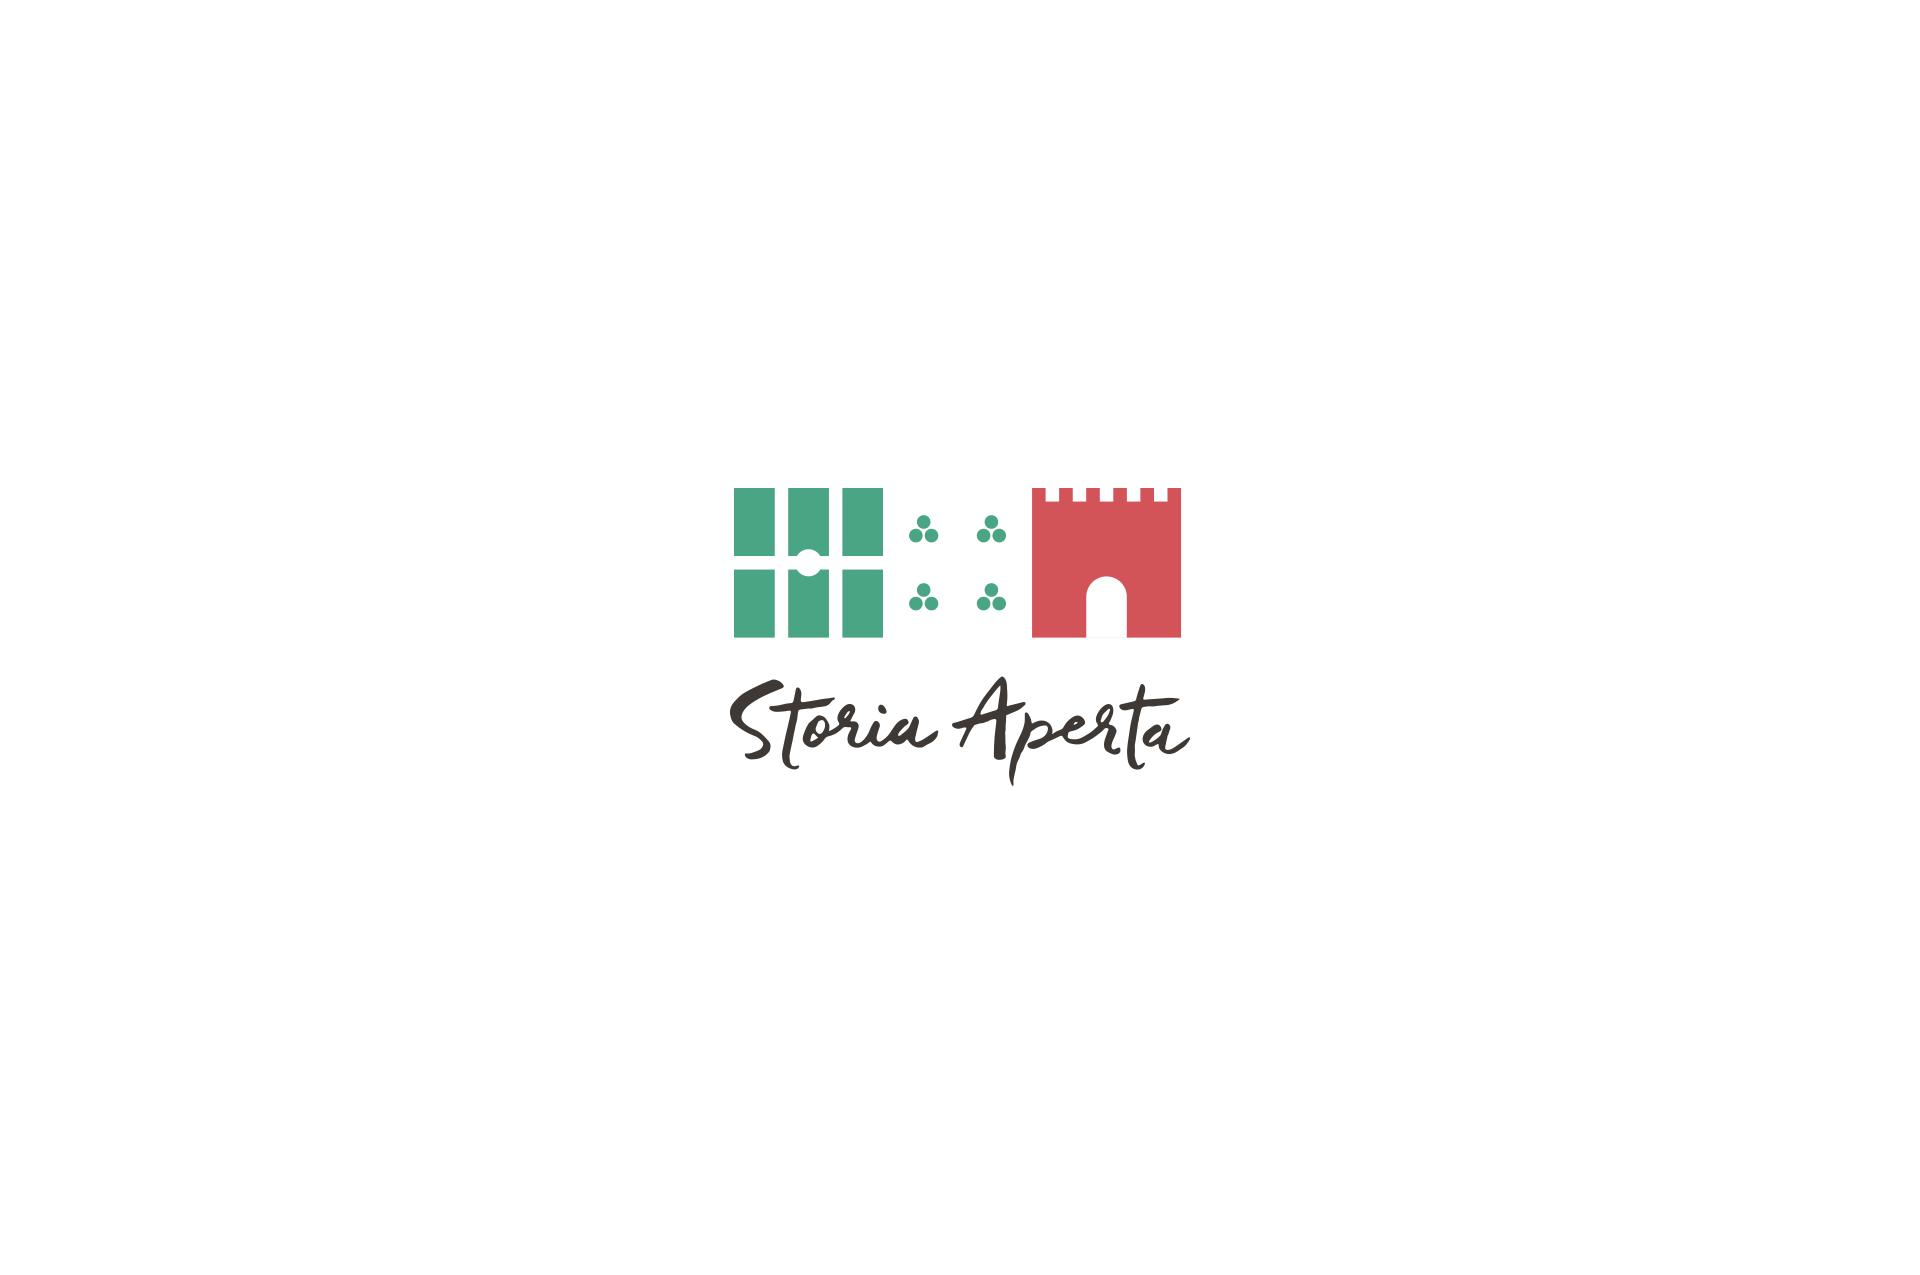 Storia Aperta Logo